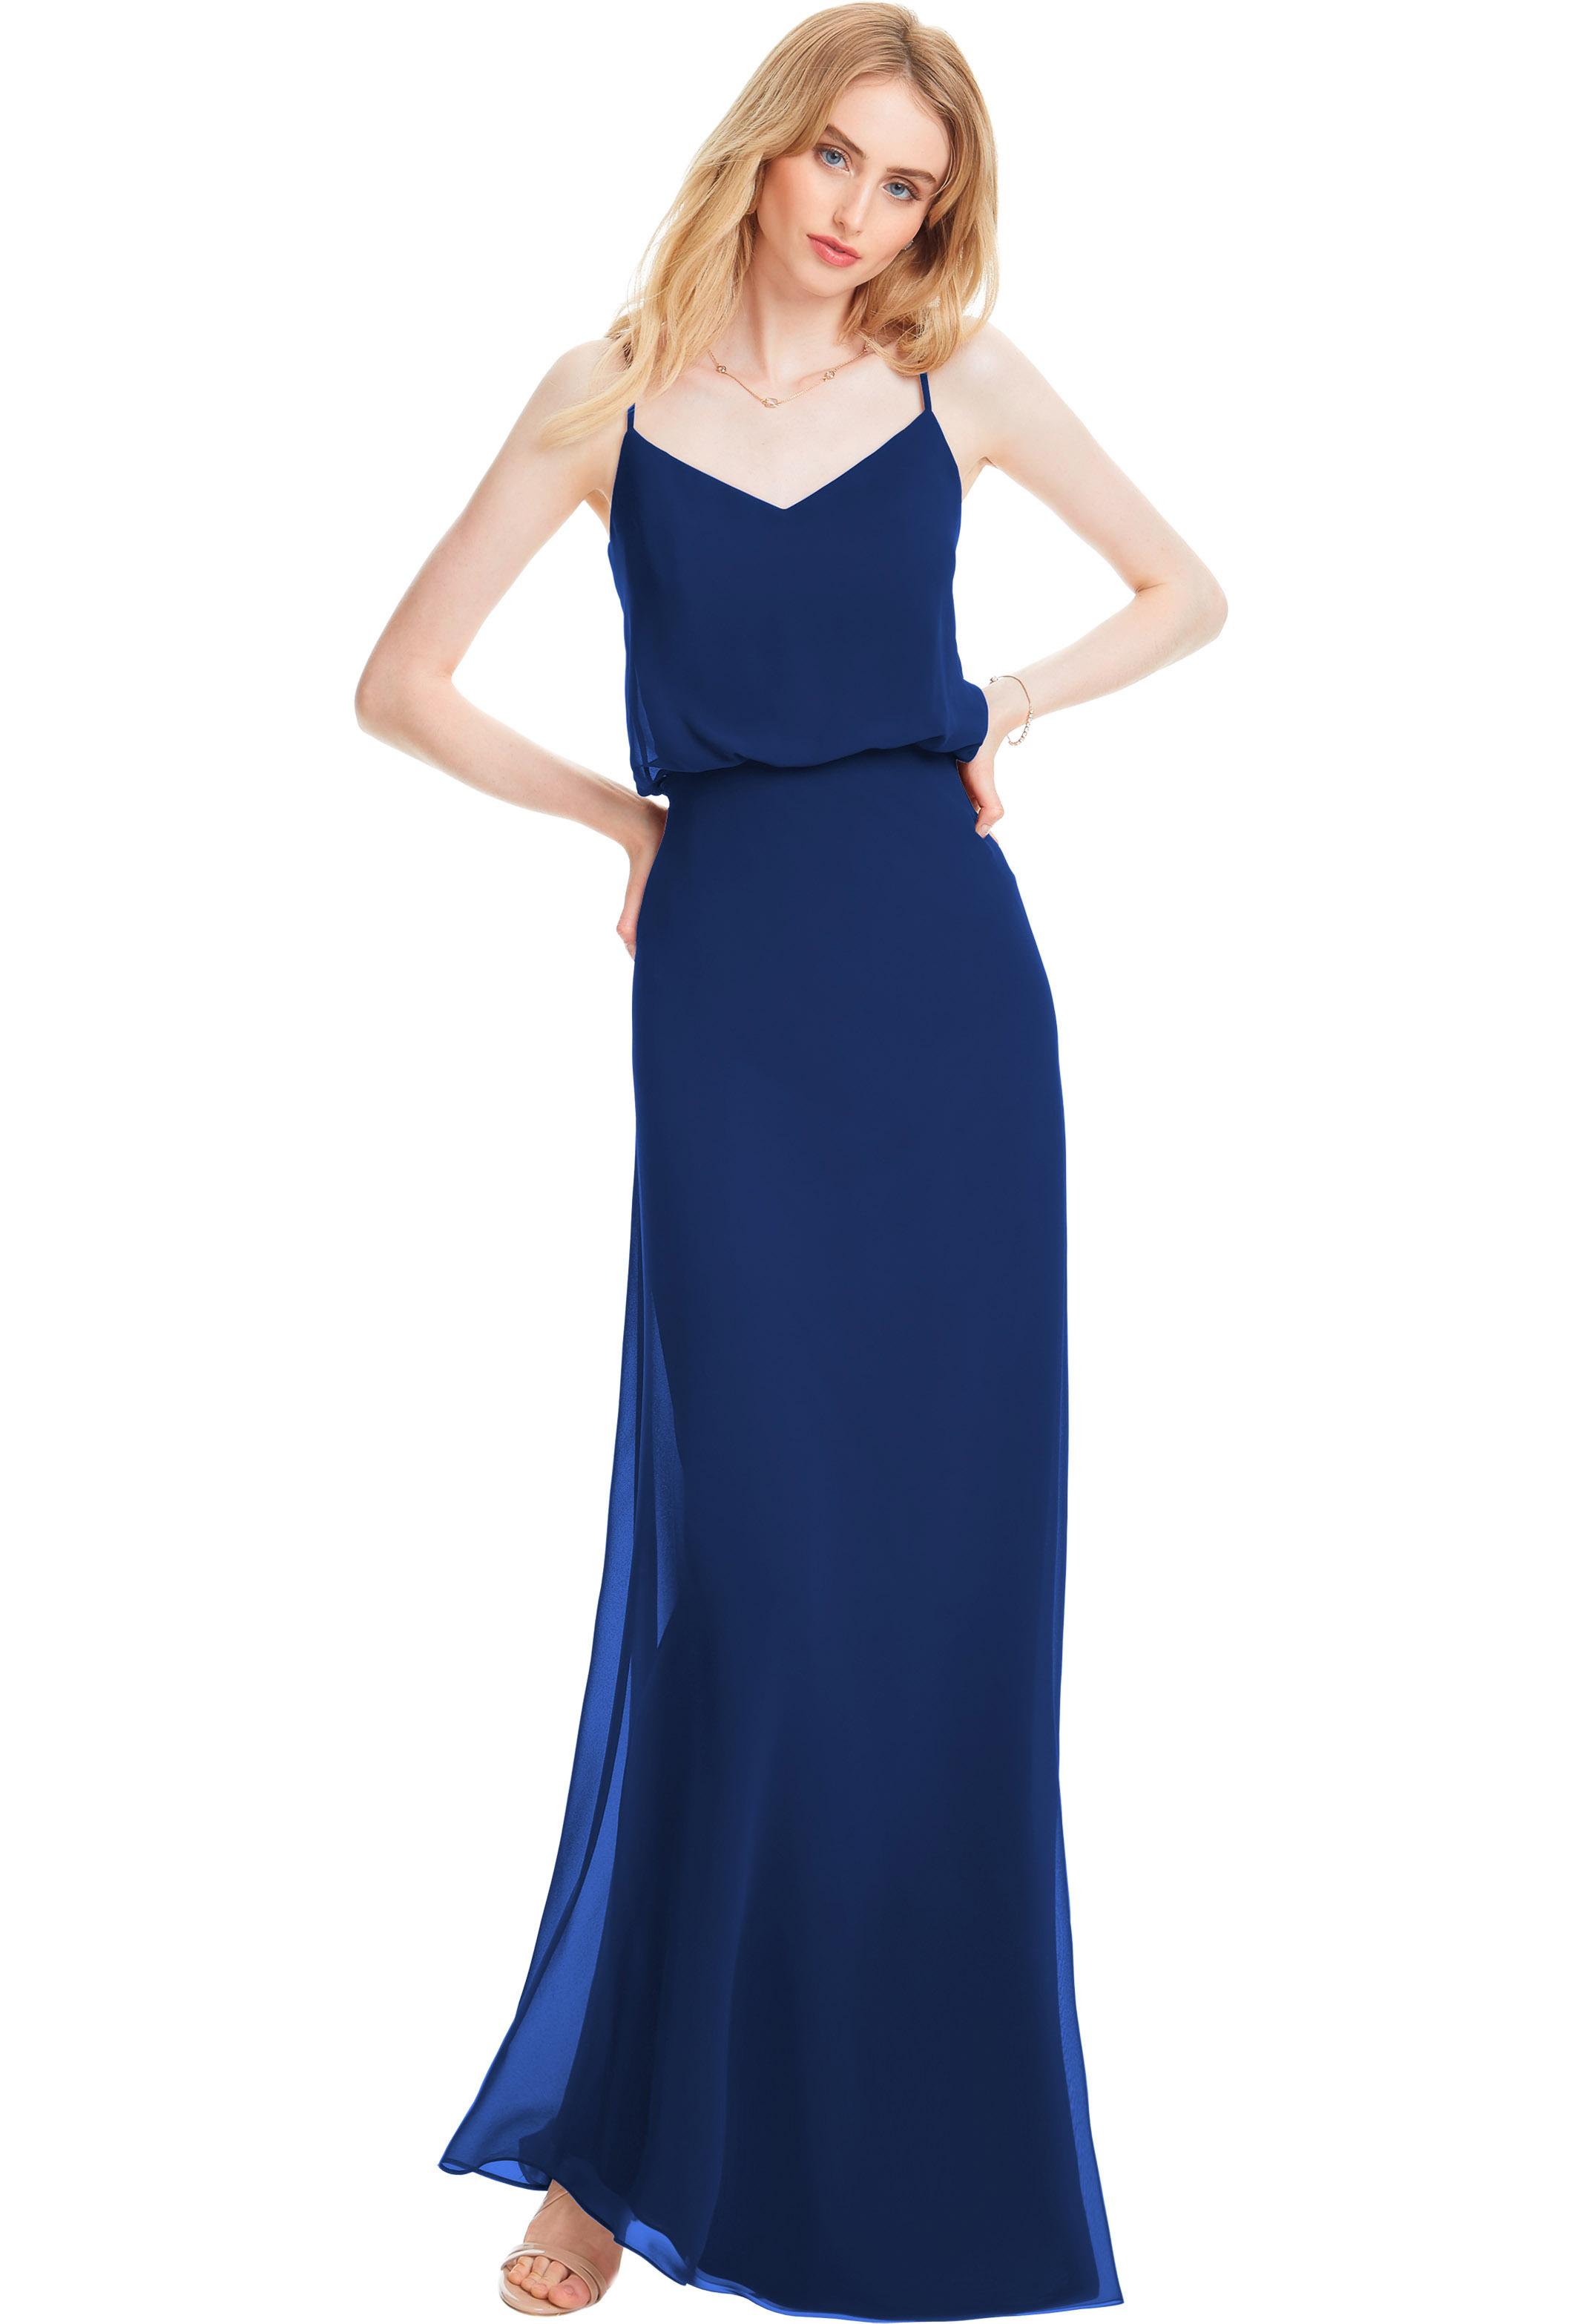 Bill Levkoff HORIZON Chiffon V-neck A-line gown, $170.00 Front